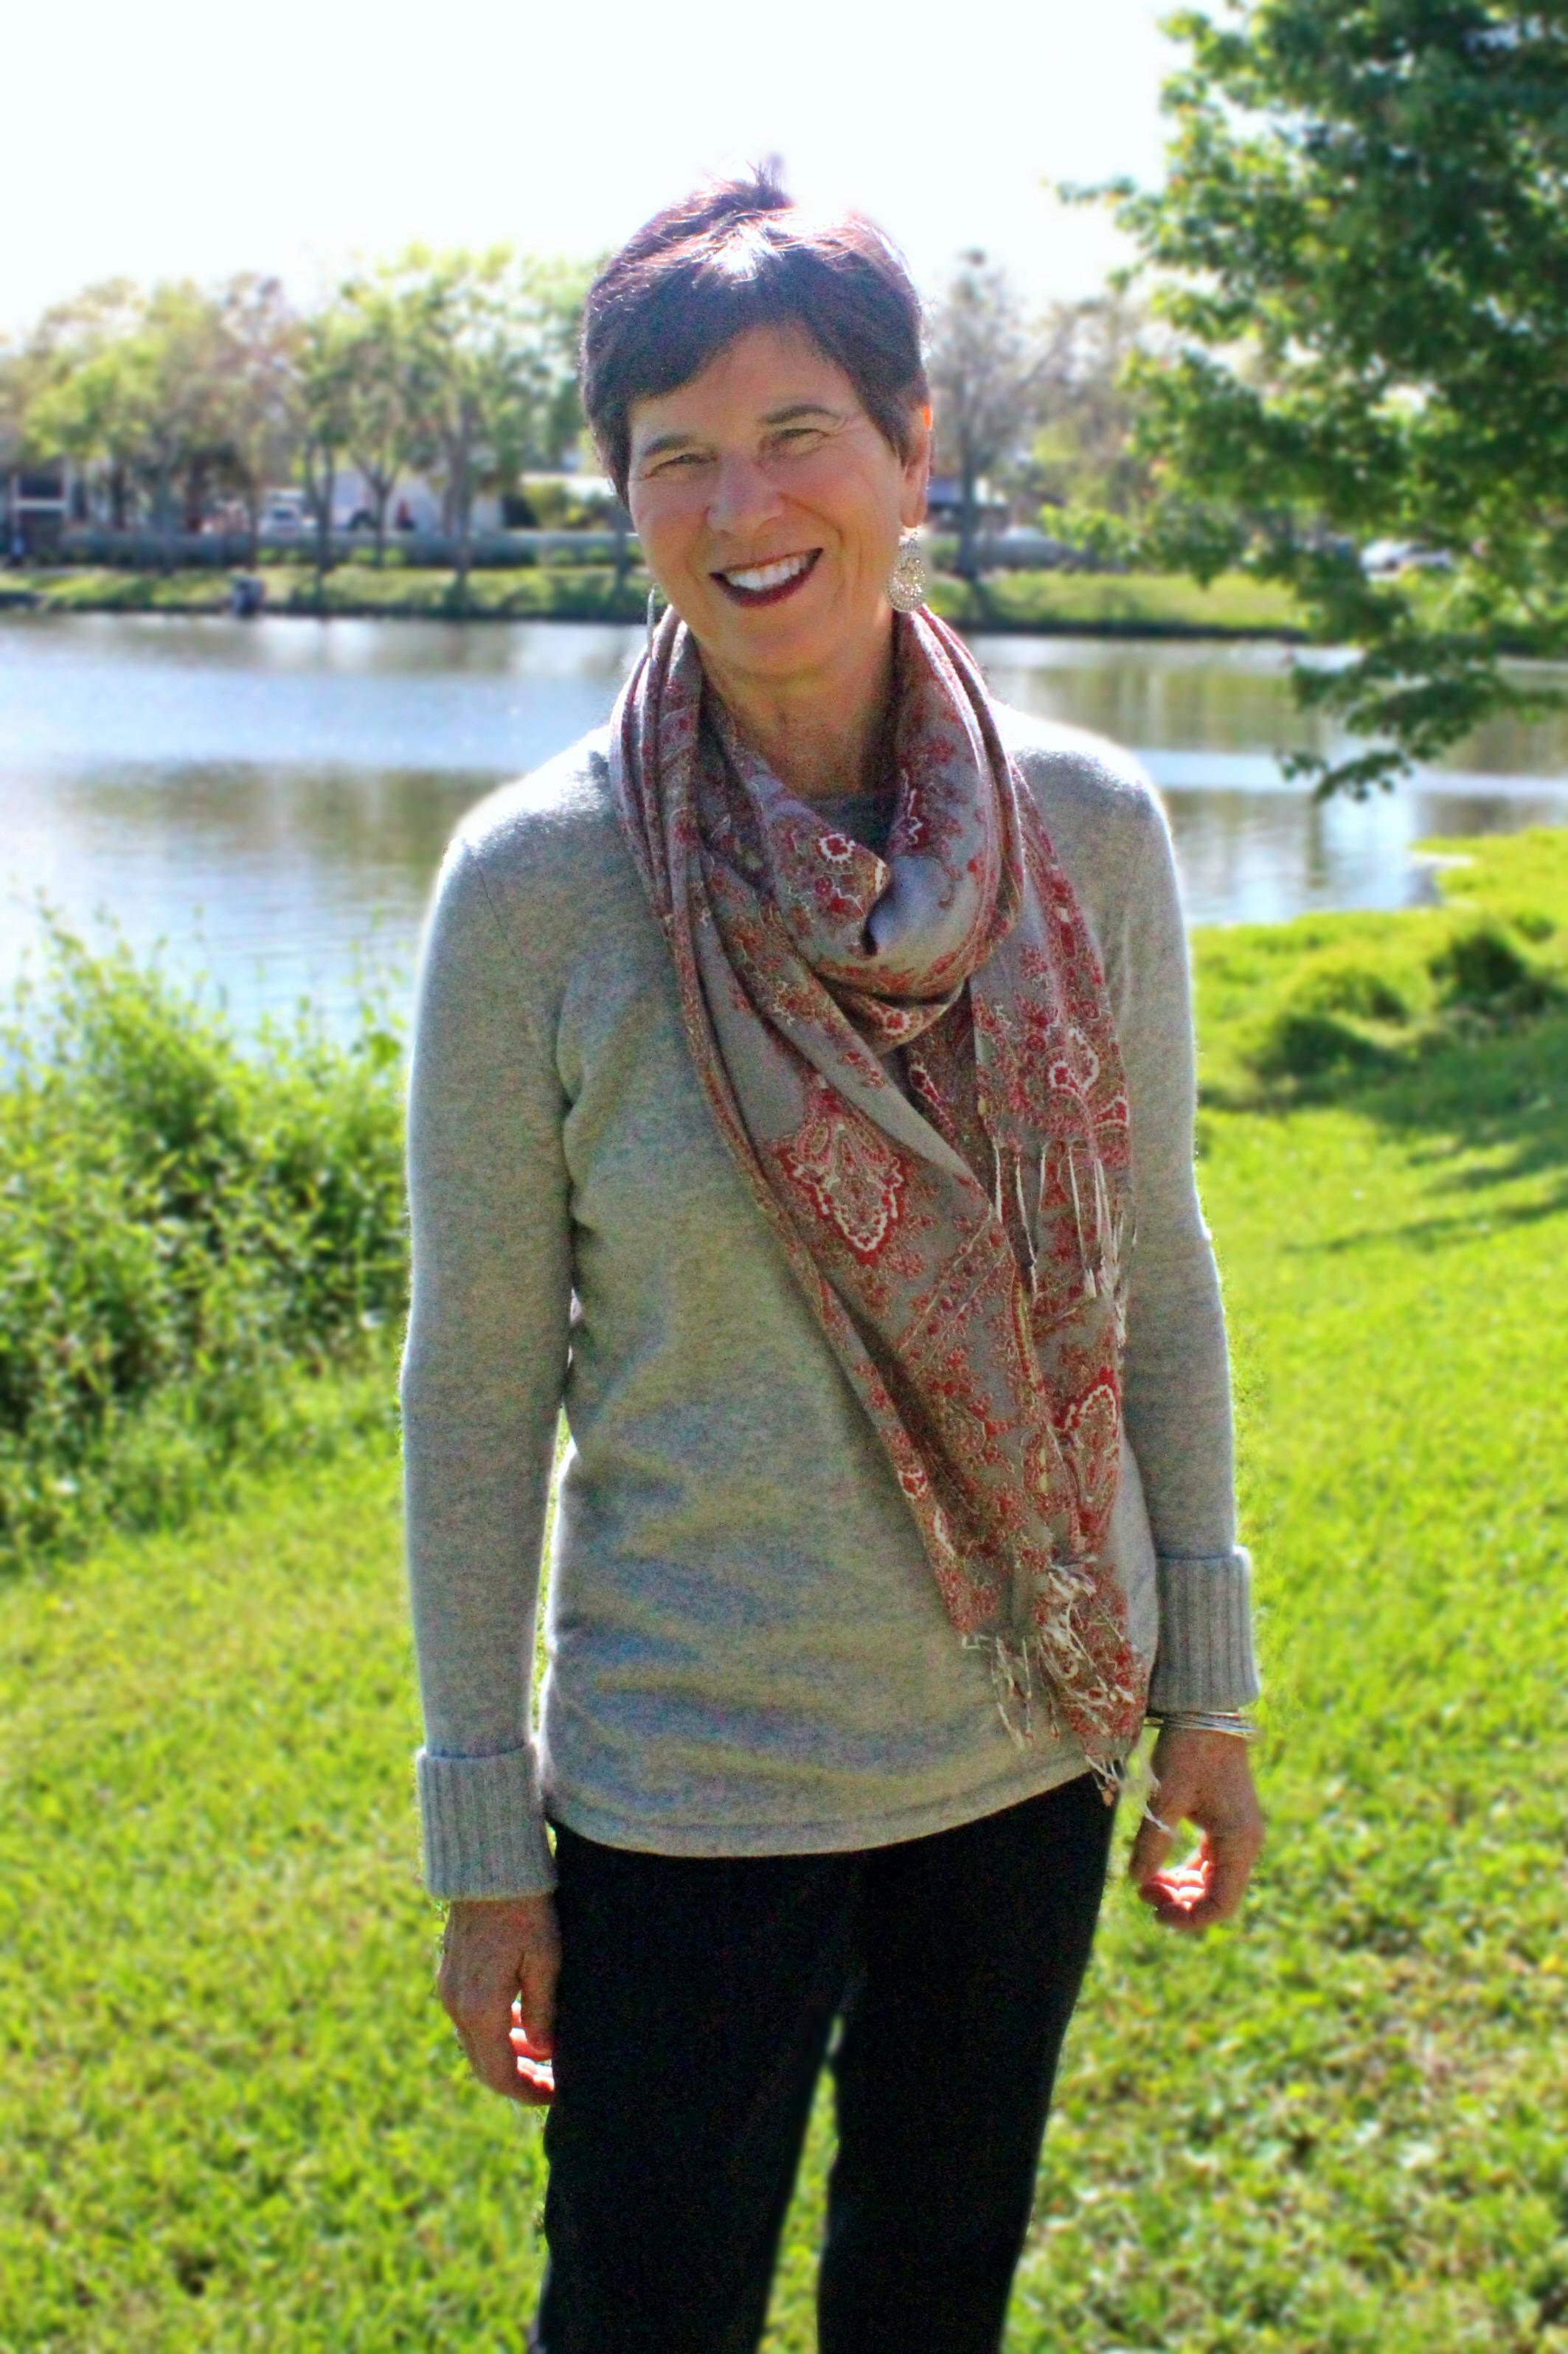 Sarah Bingham, MS, CNS, LDN